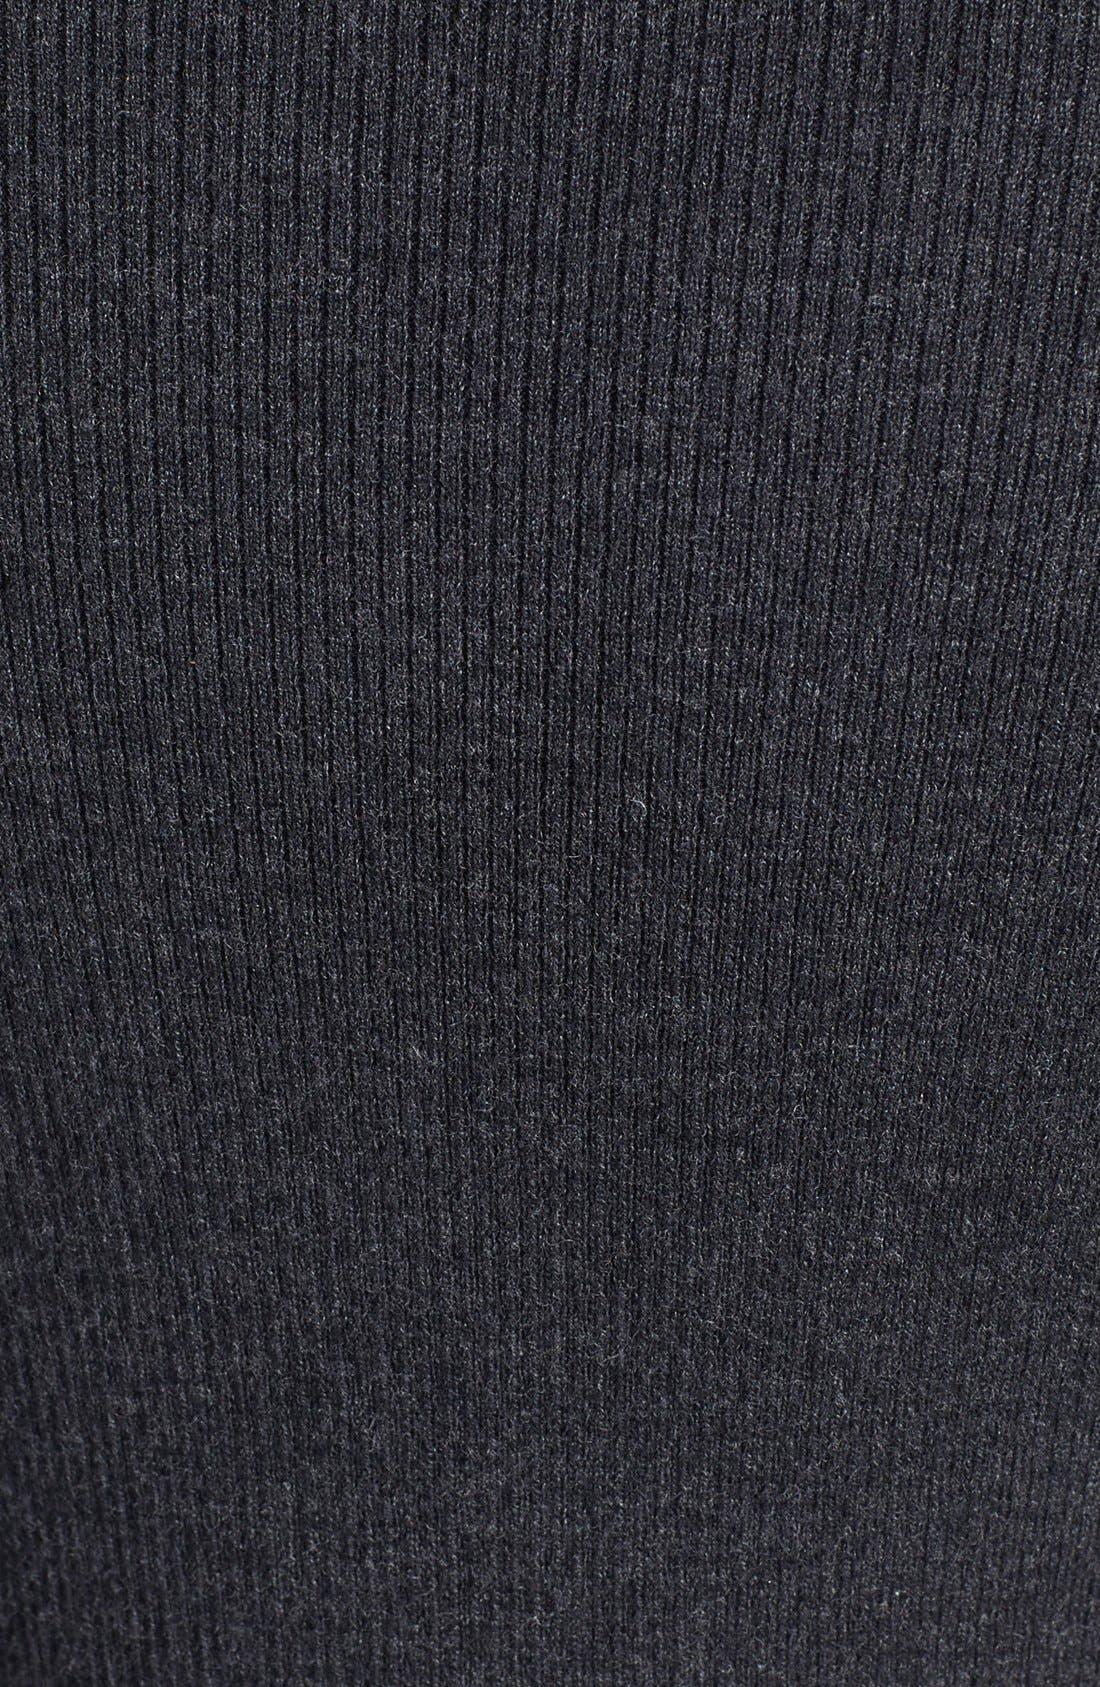 Alternate Image 3  - Theyskens' Theory 'Karalyn Yevi' Sweater Dress